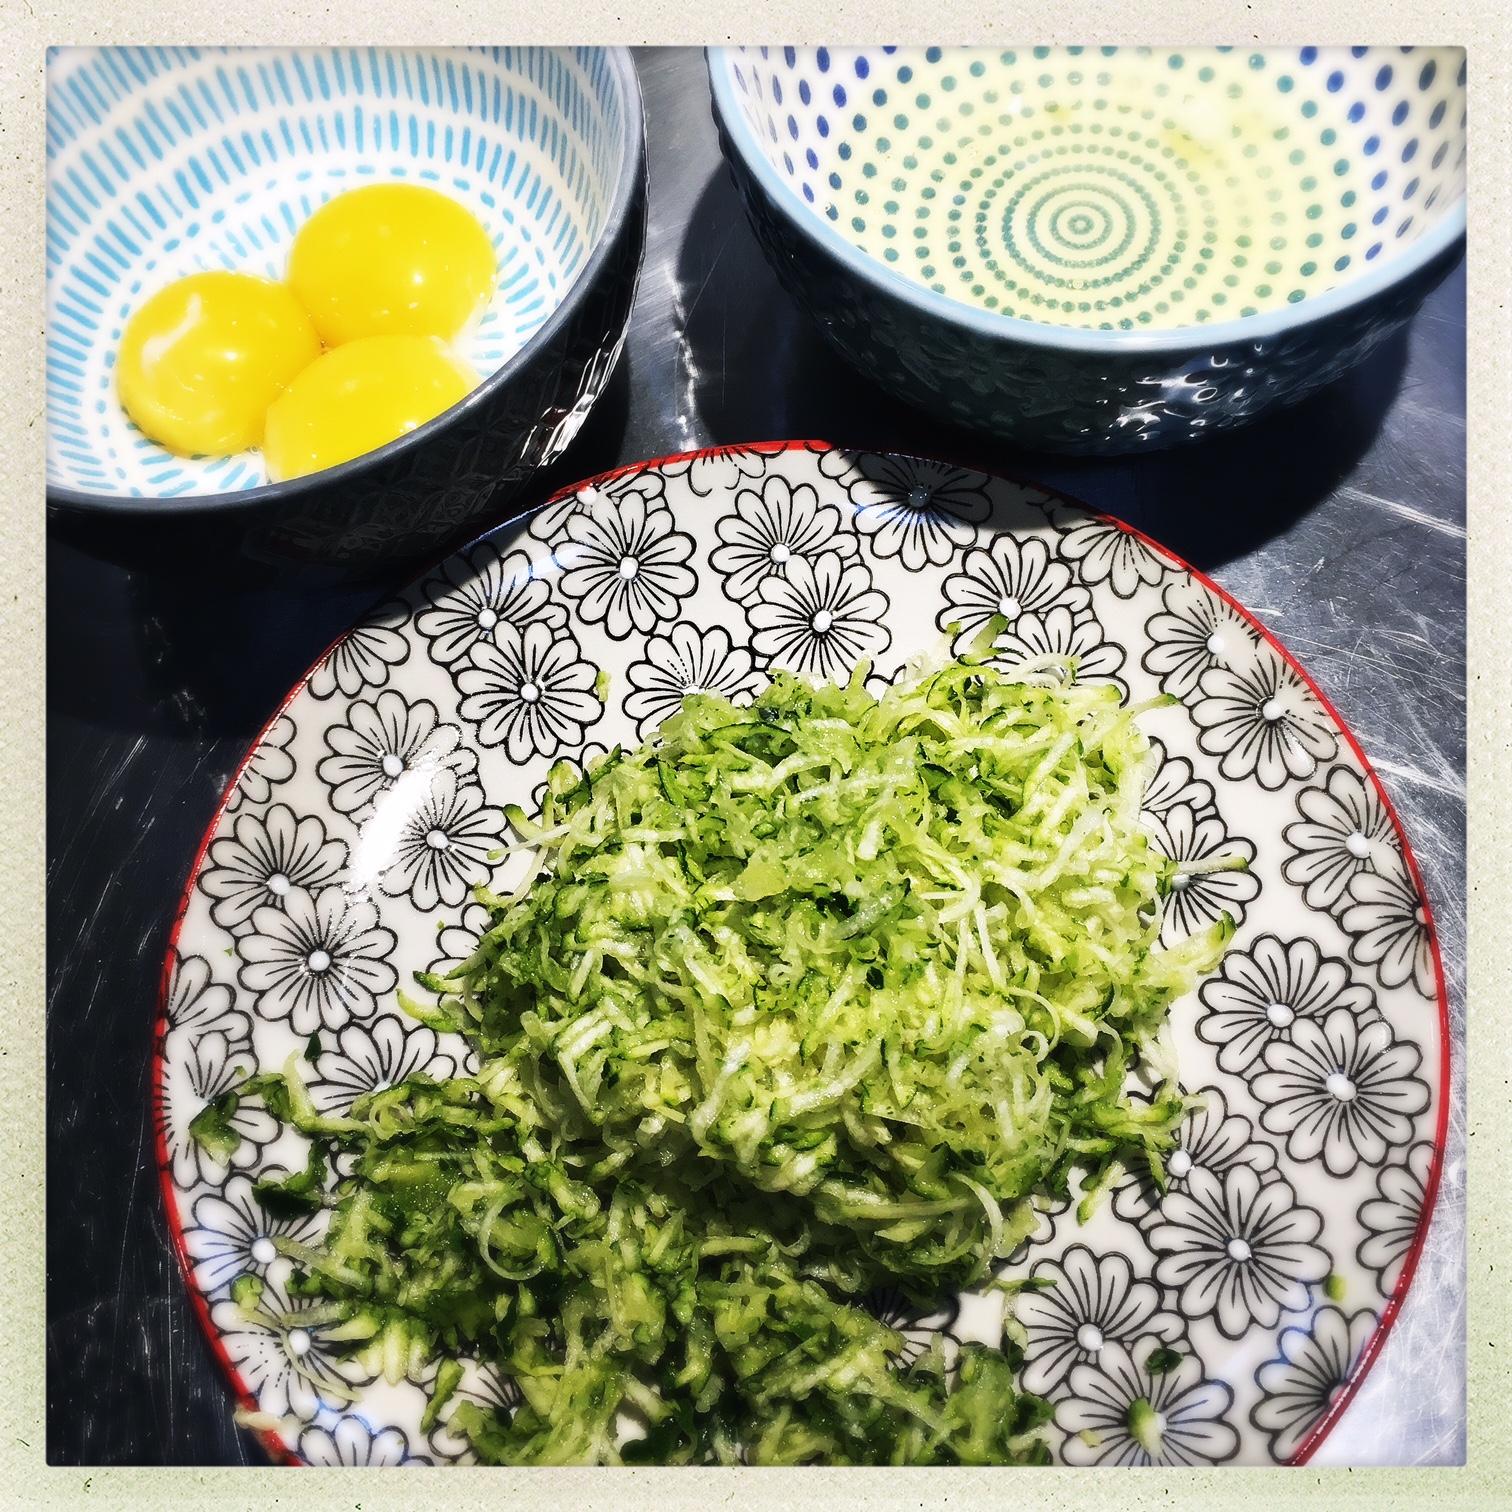 zucchini and eggs .jpg